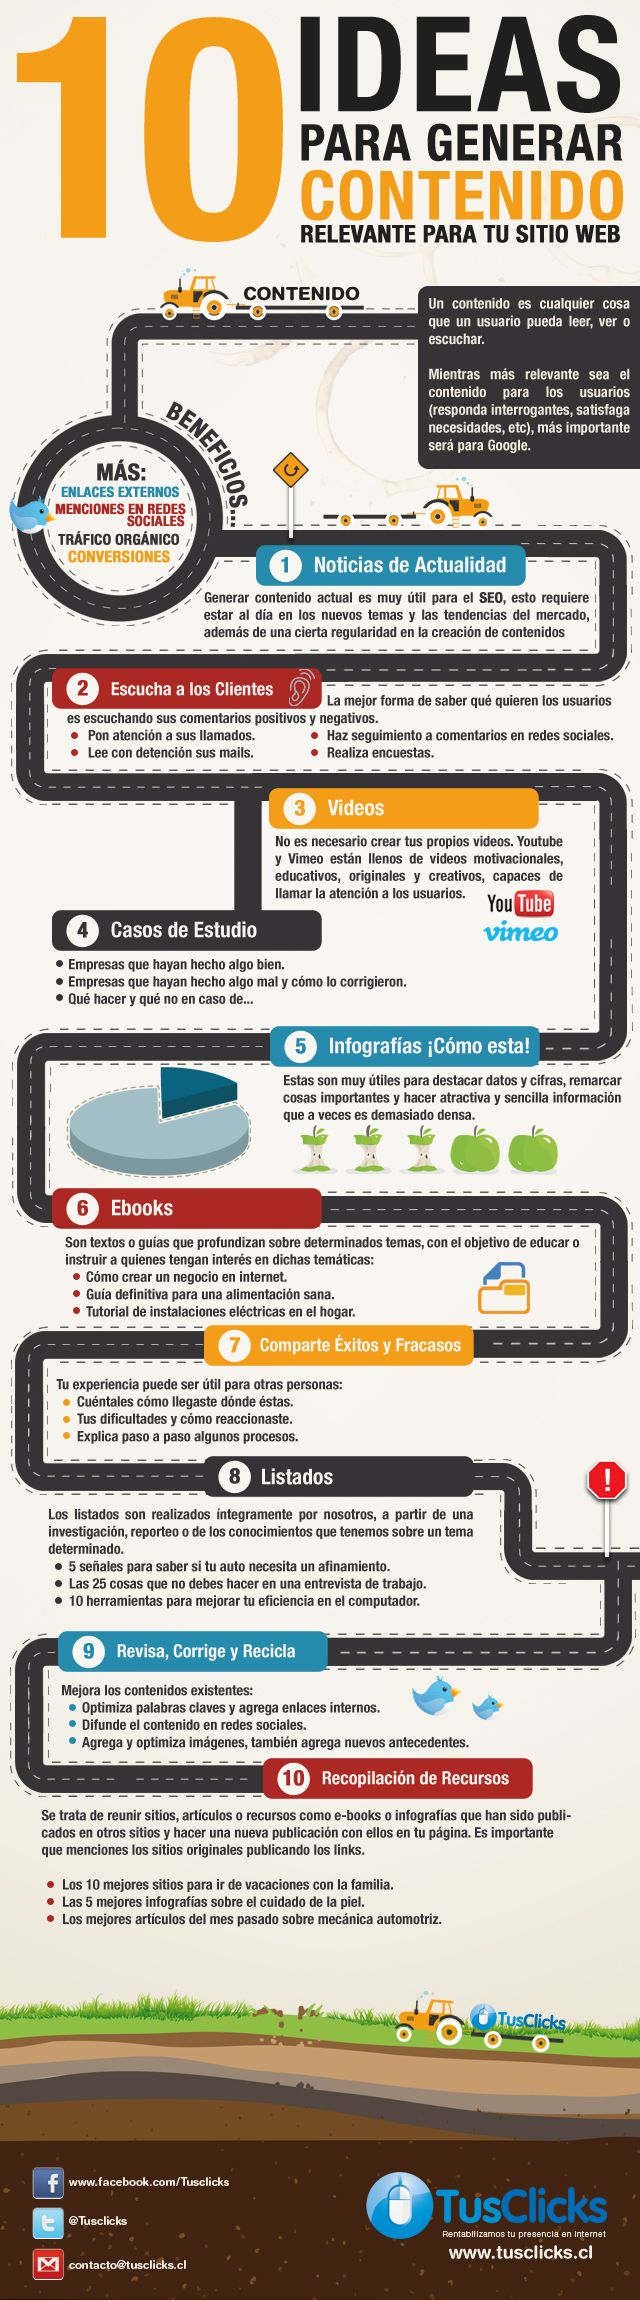 #Consejo2_0 10 ideas para generar contenido relevante para tu web #infografia